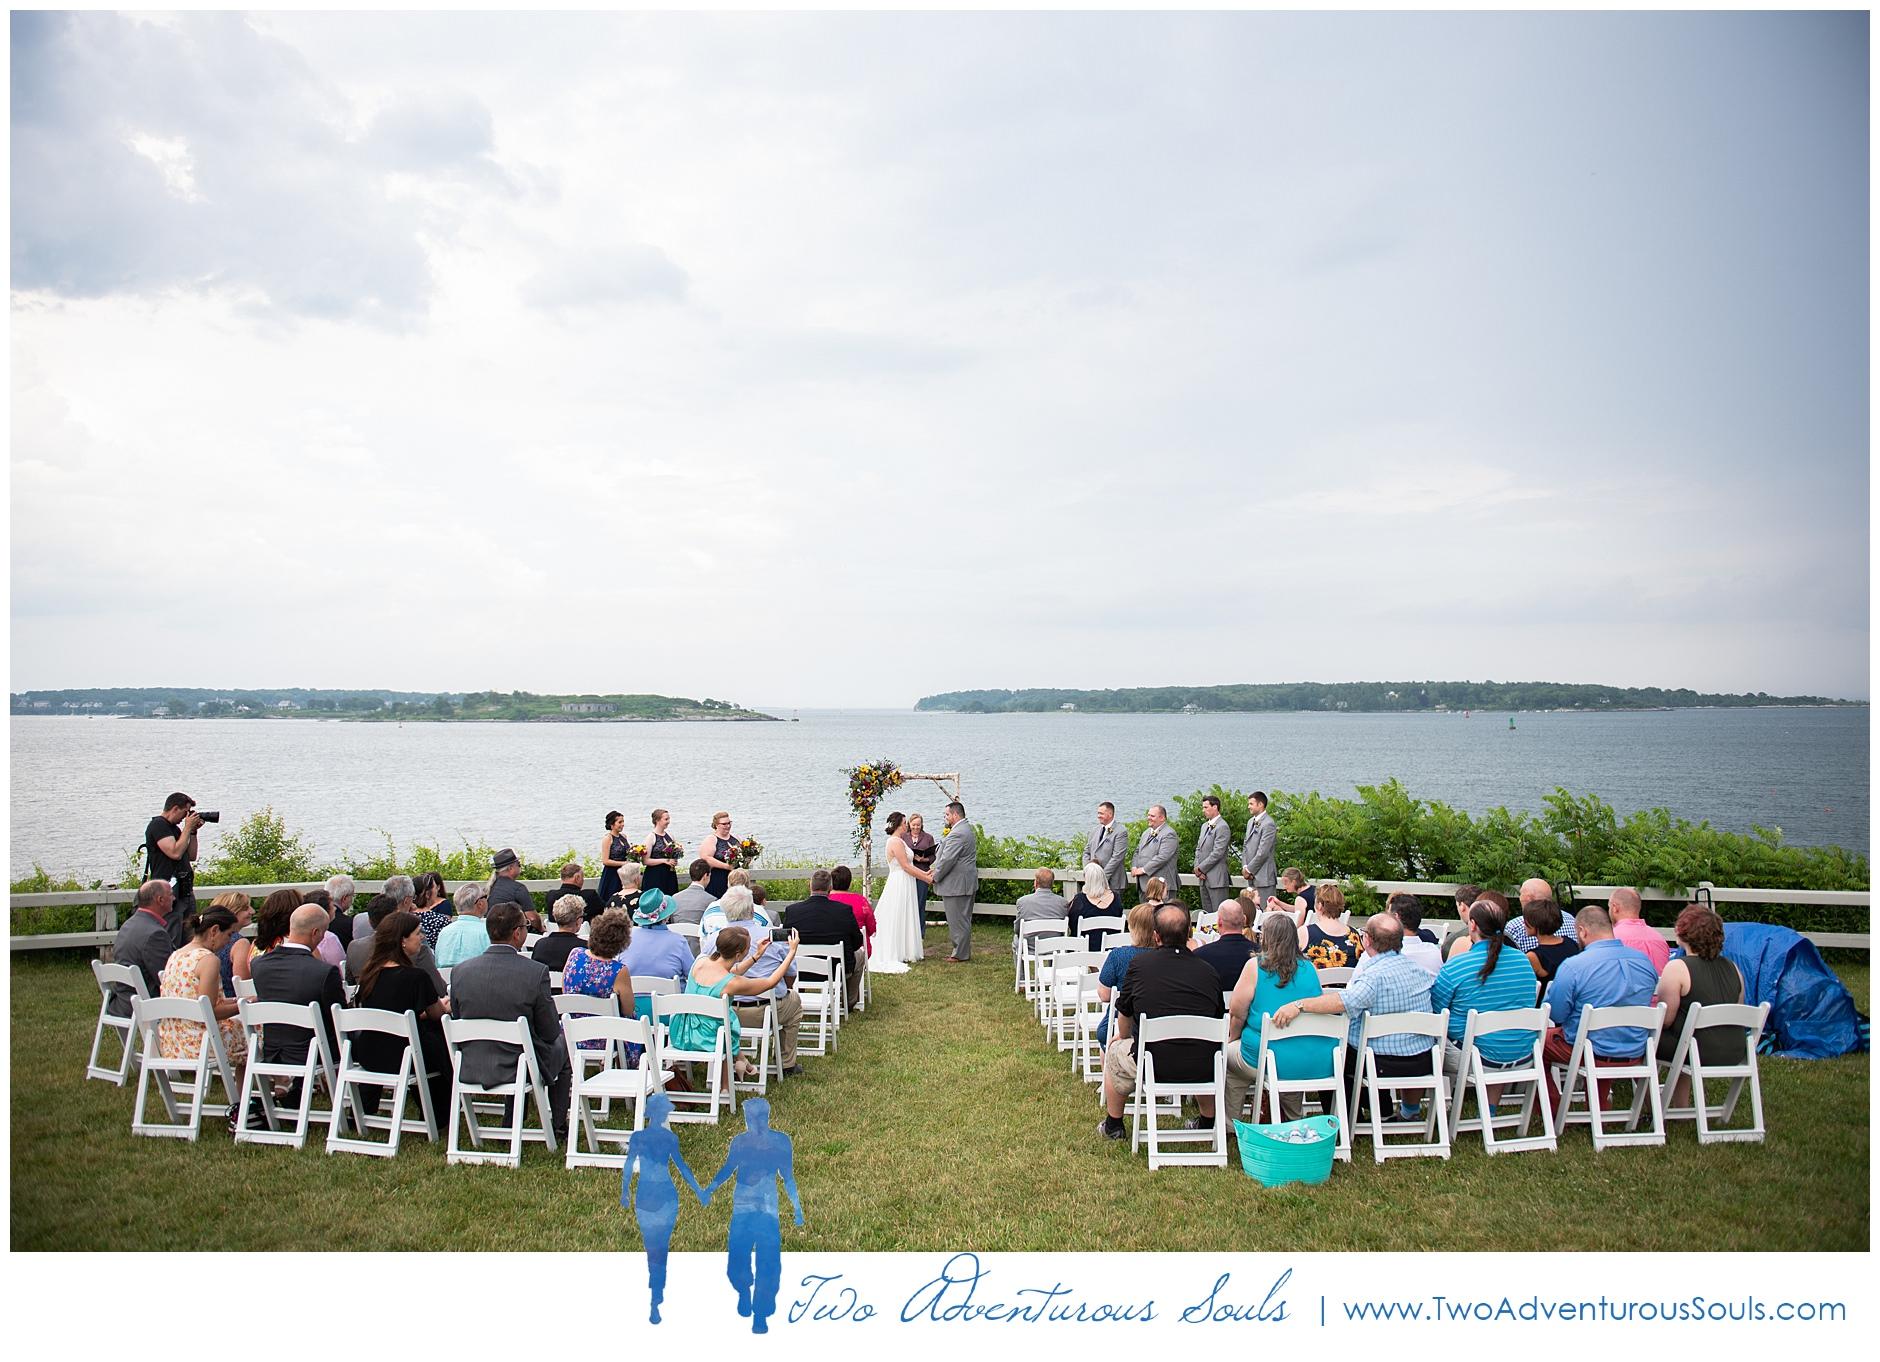 Maine Wedding Photographers, SMCC Wedding Photographers, Southern Maine Community College Wedding Photographers, Two Adventurous Souls-AshleyAaron_0026.jpg